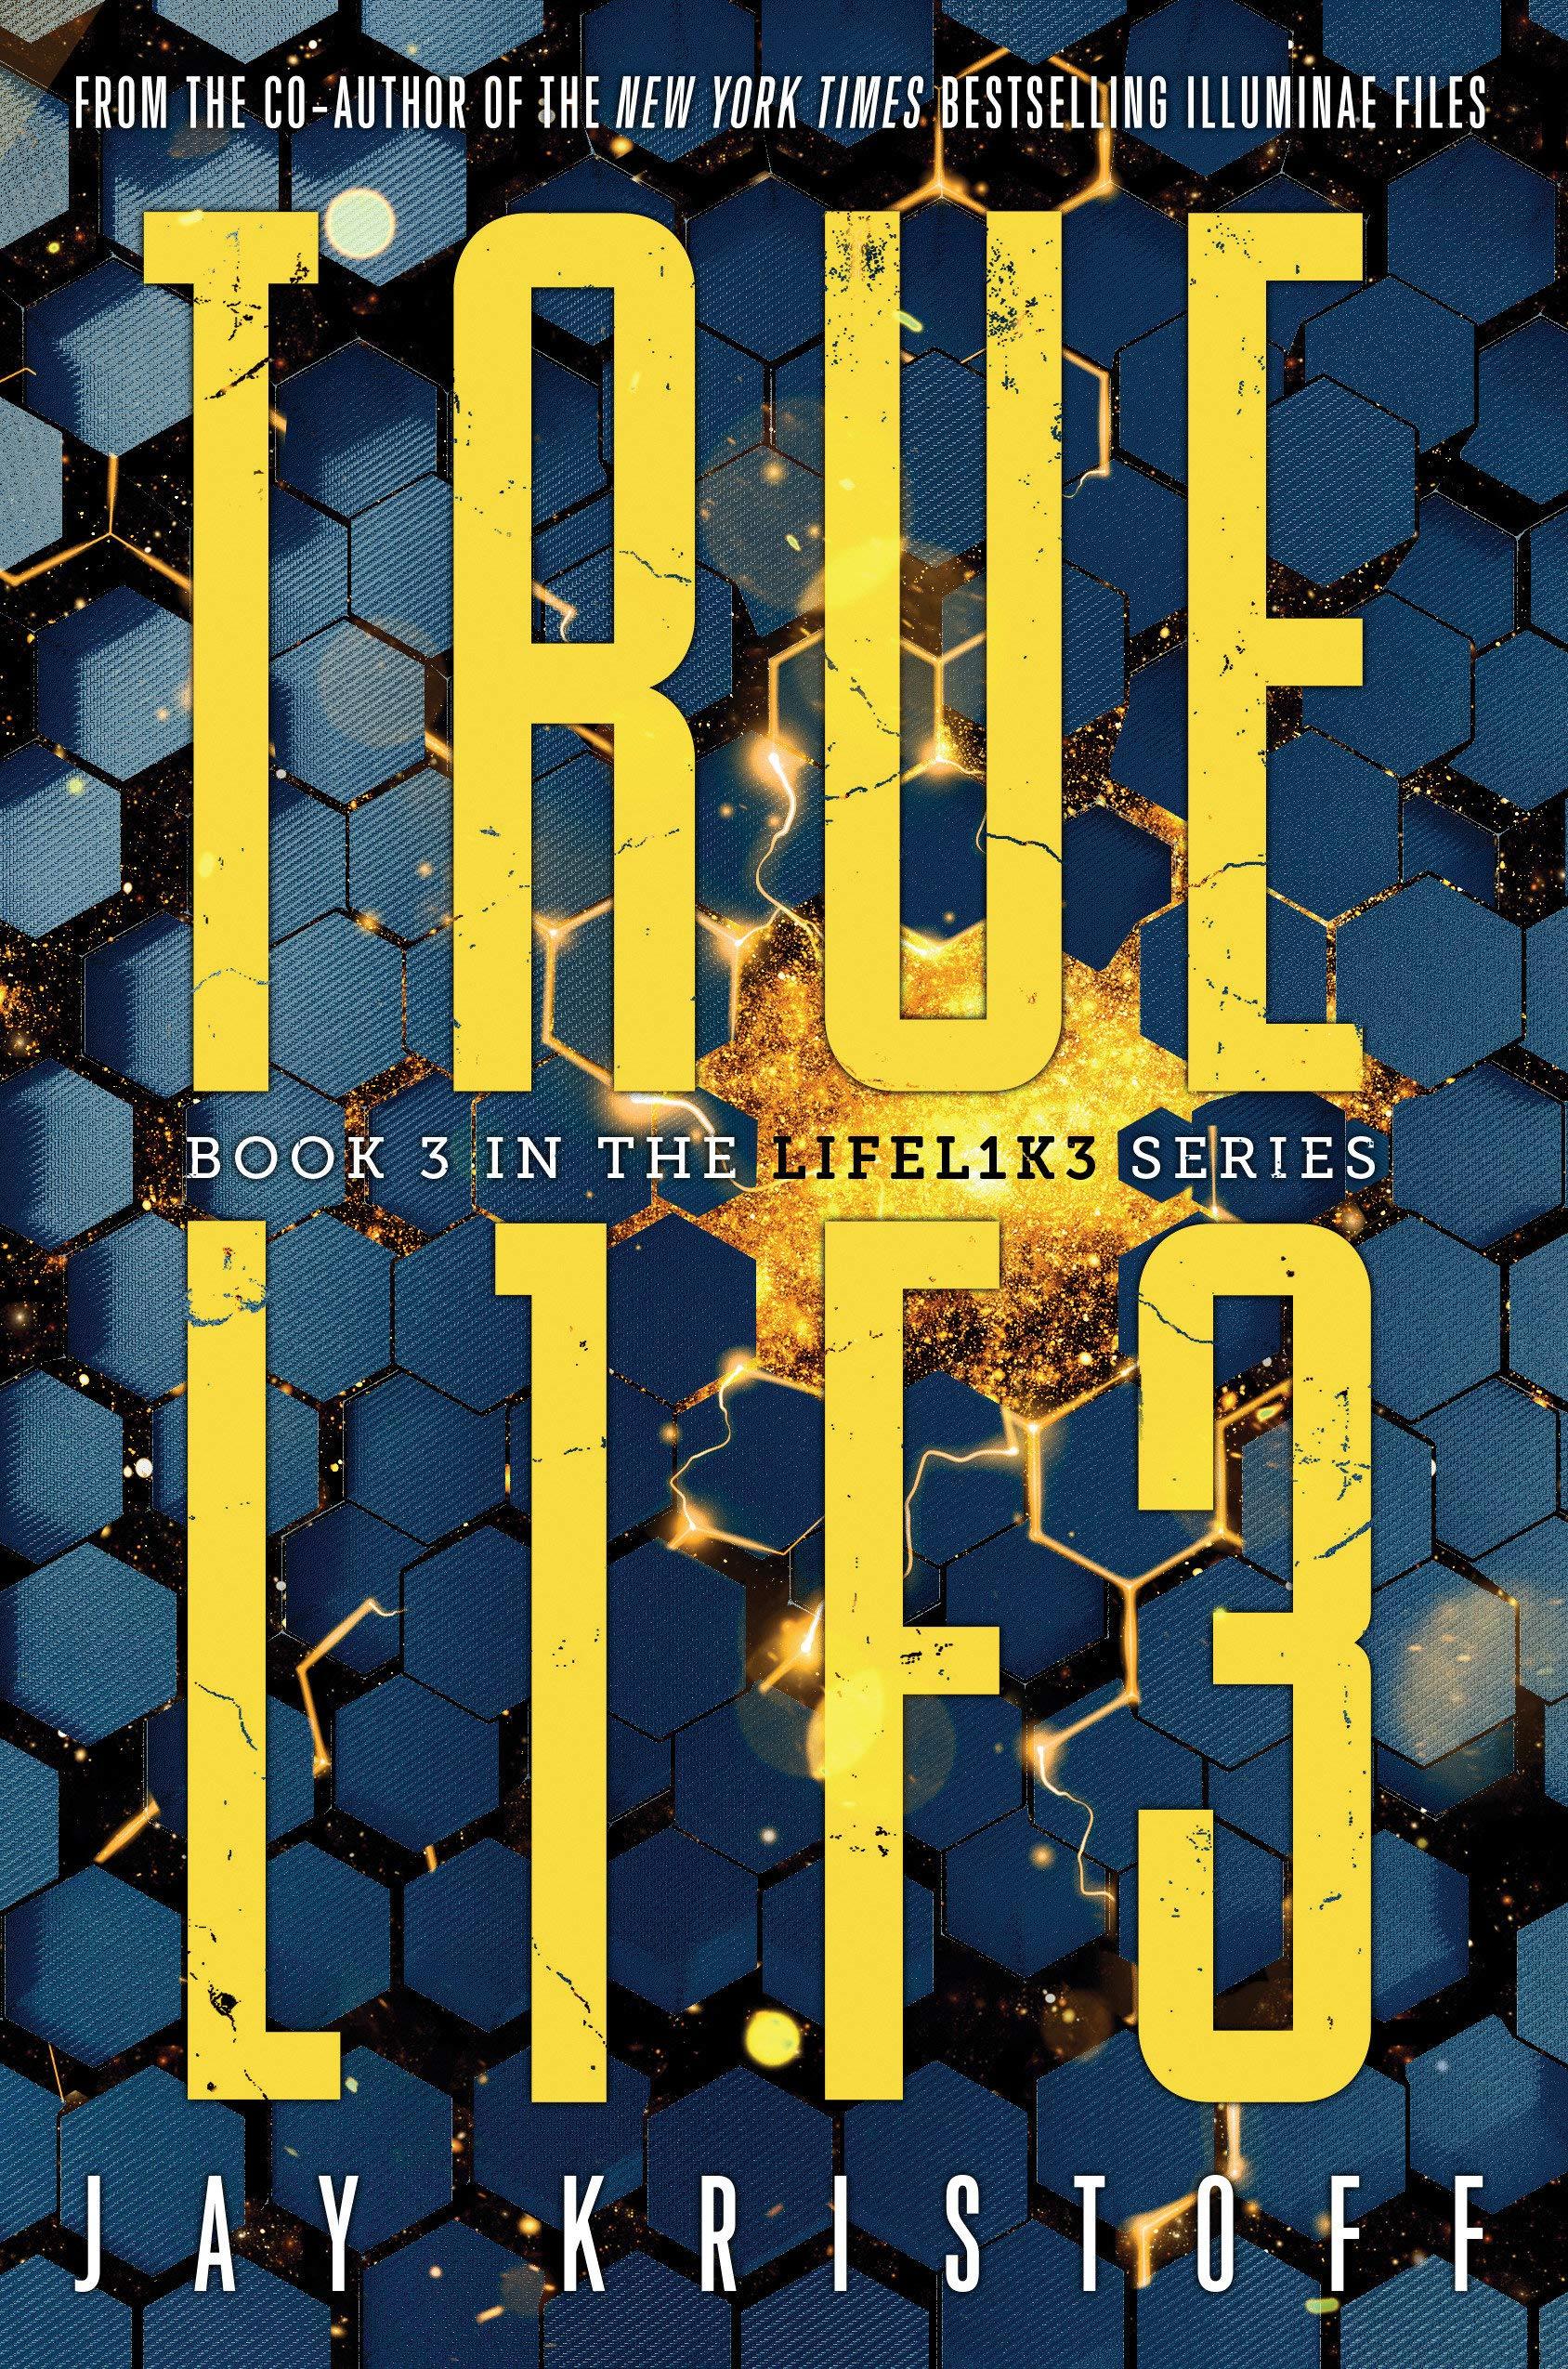 Amazon.com: TRUEL1F3 (Truelife) (LIFEL1K3) (9781524714000): Kristoff, Jay:  Books